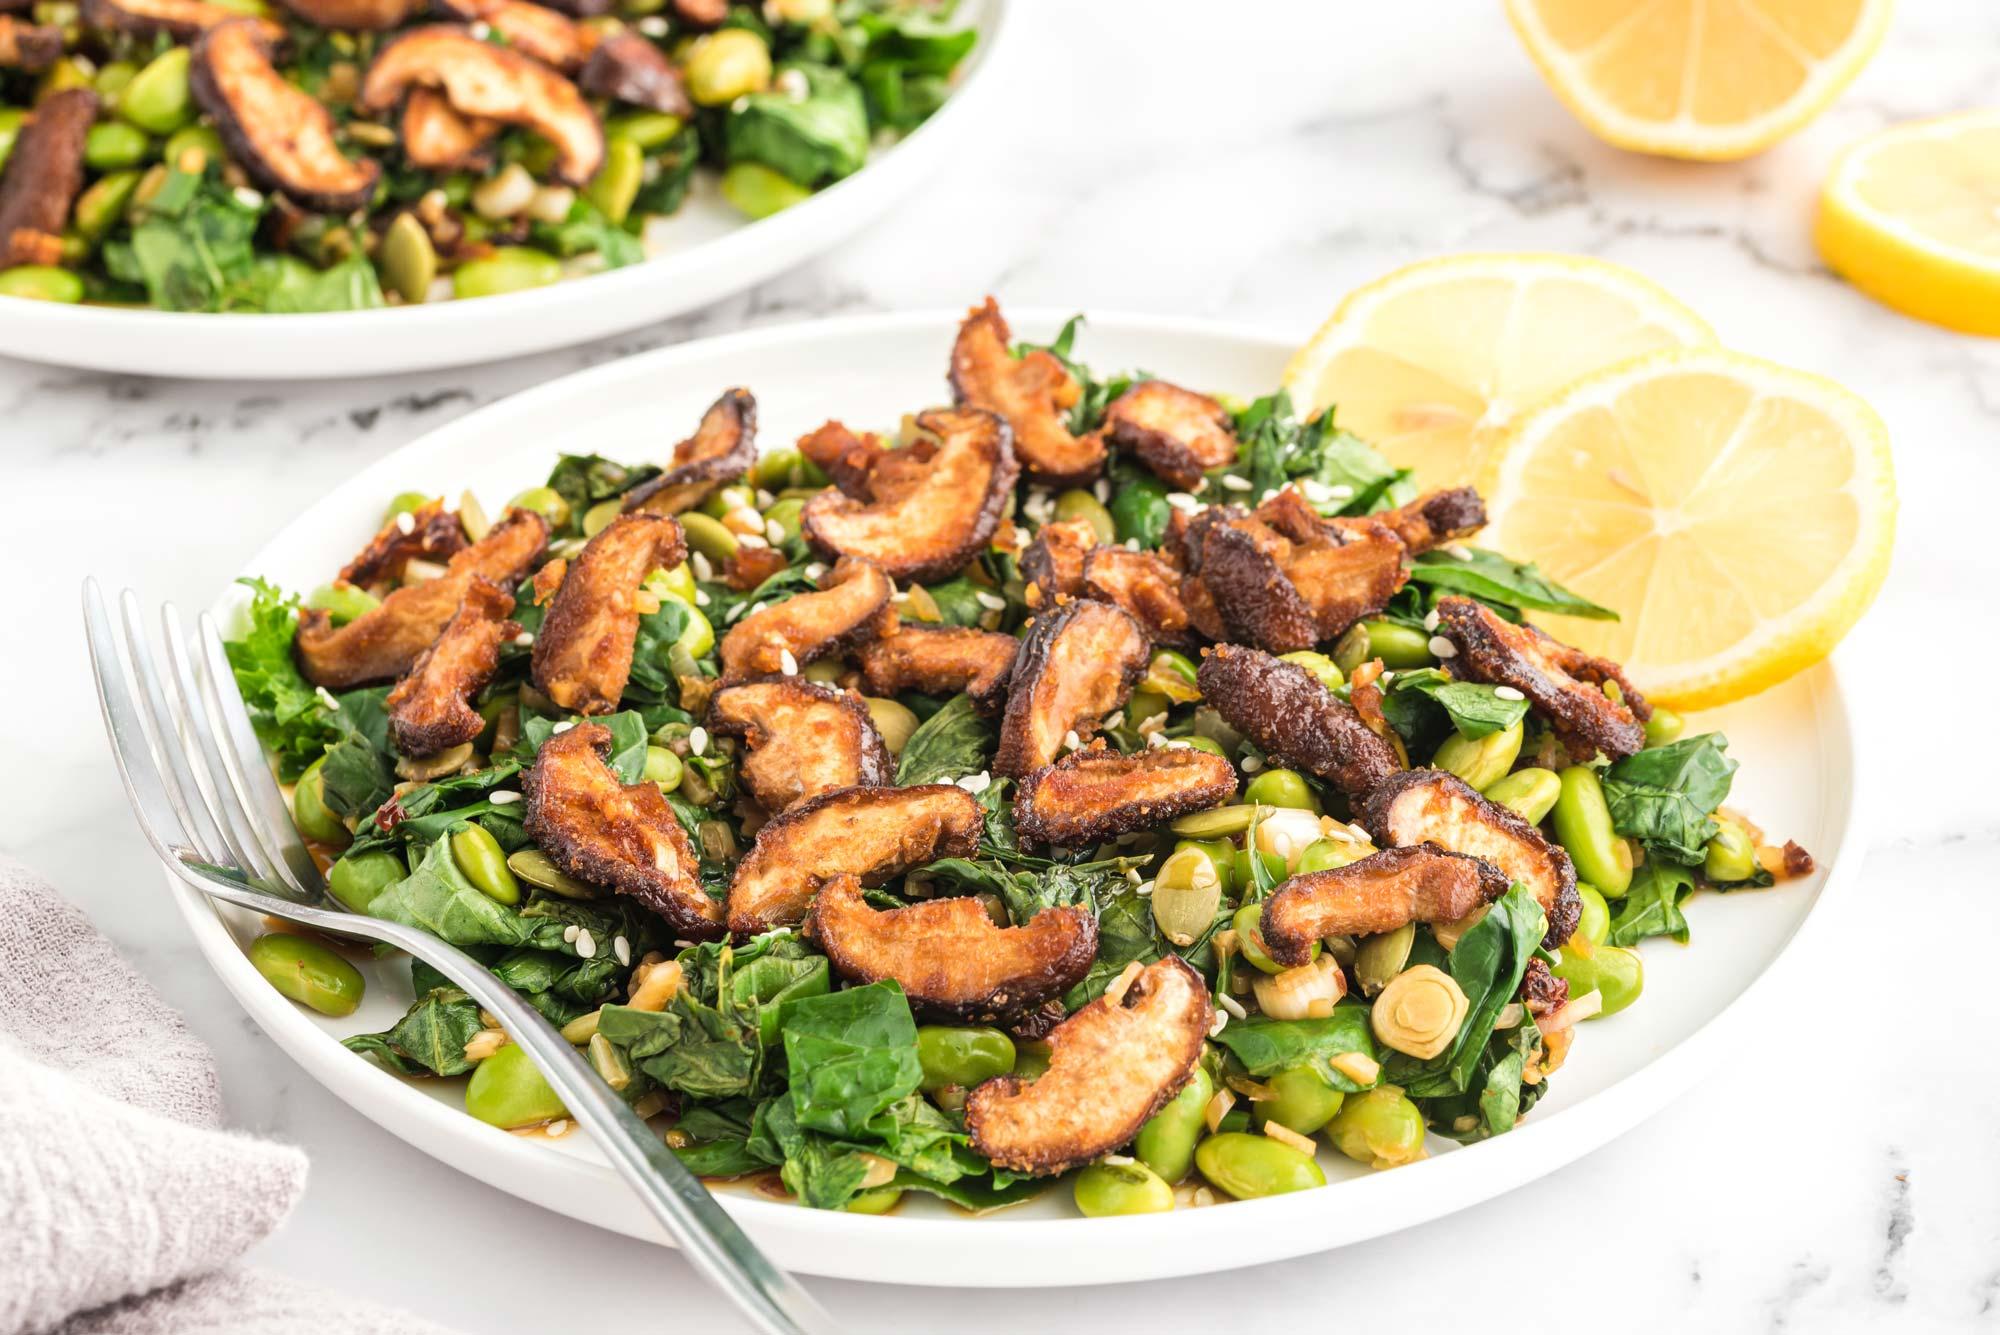 Food combining recipe - Warm kale edamame salad with shiitake bacon